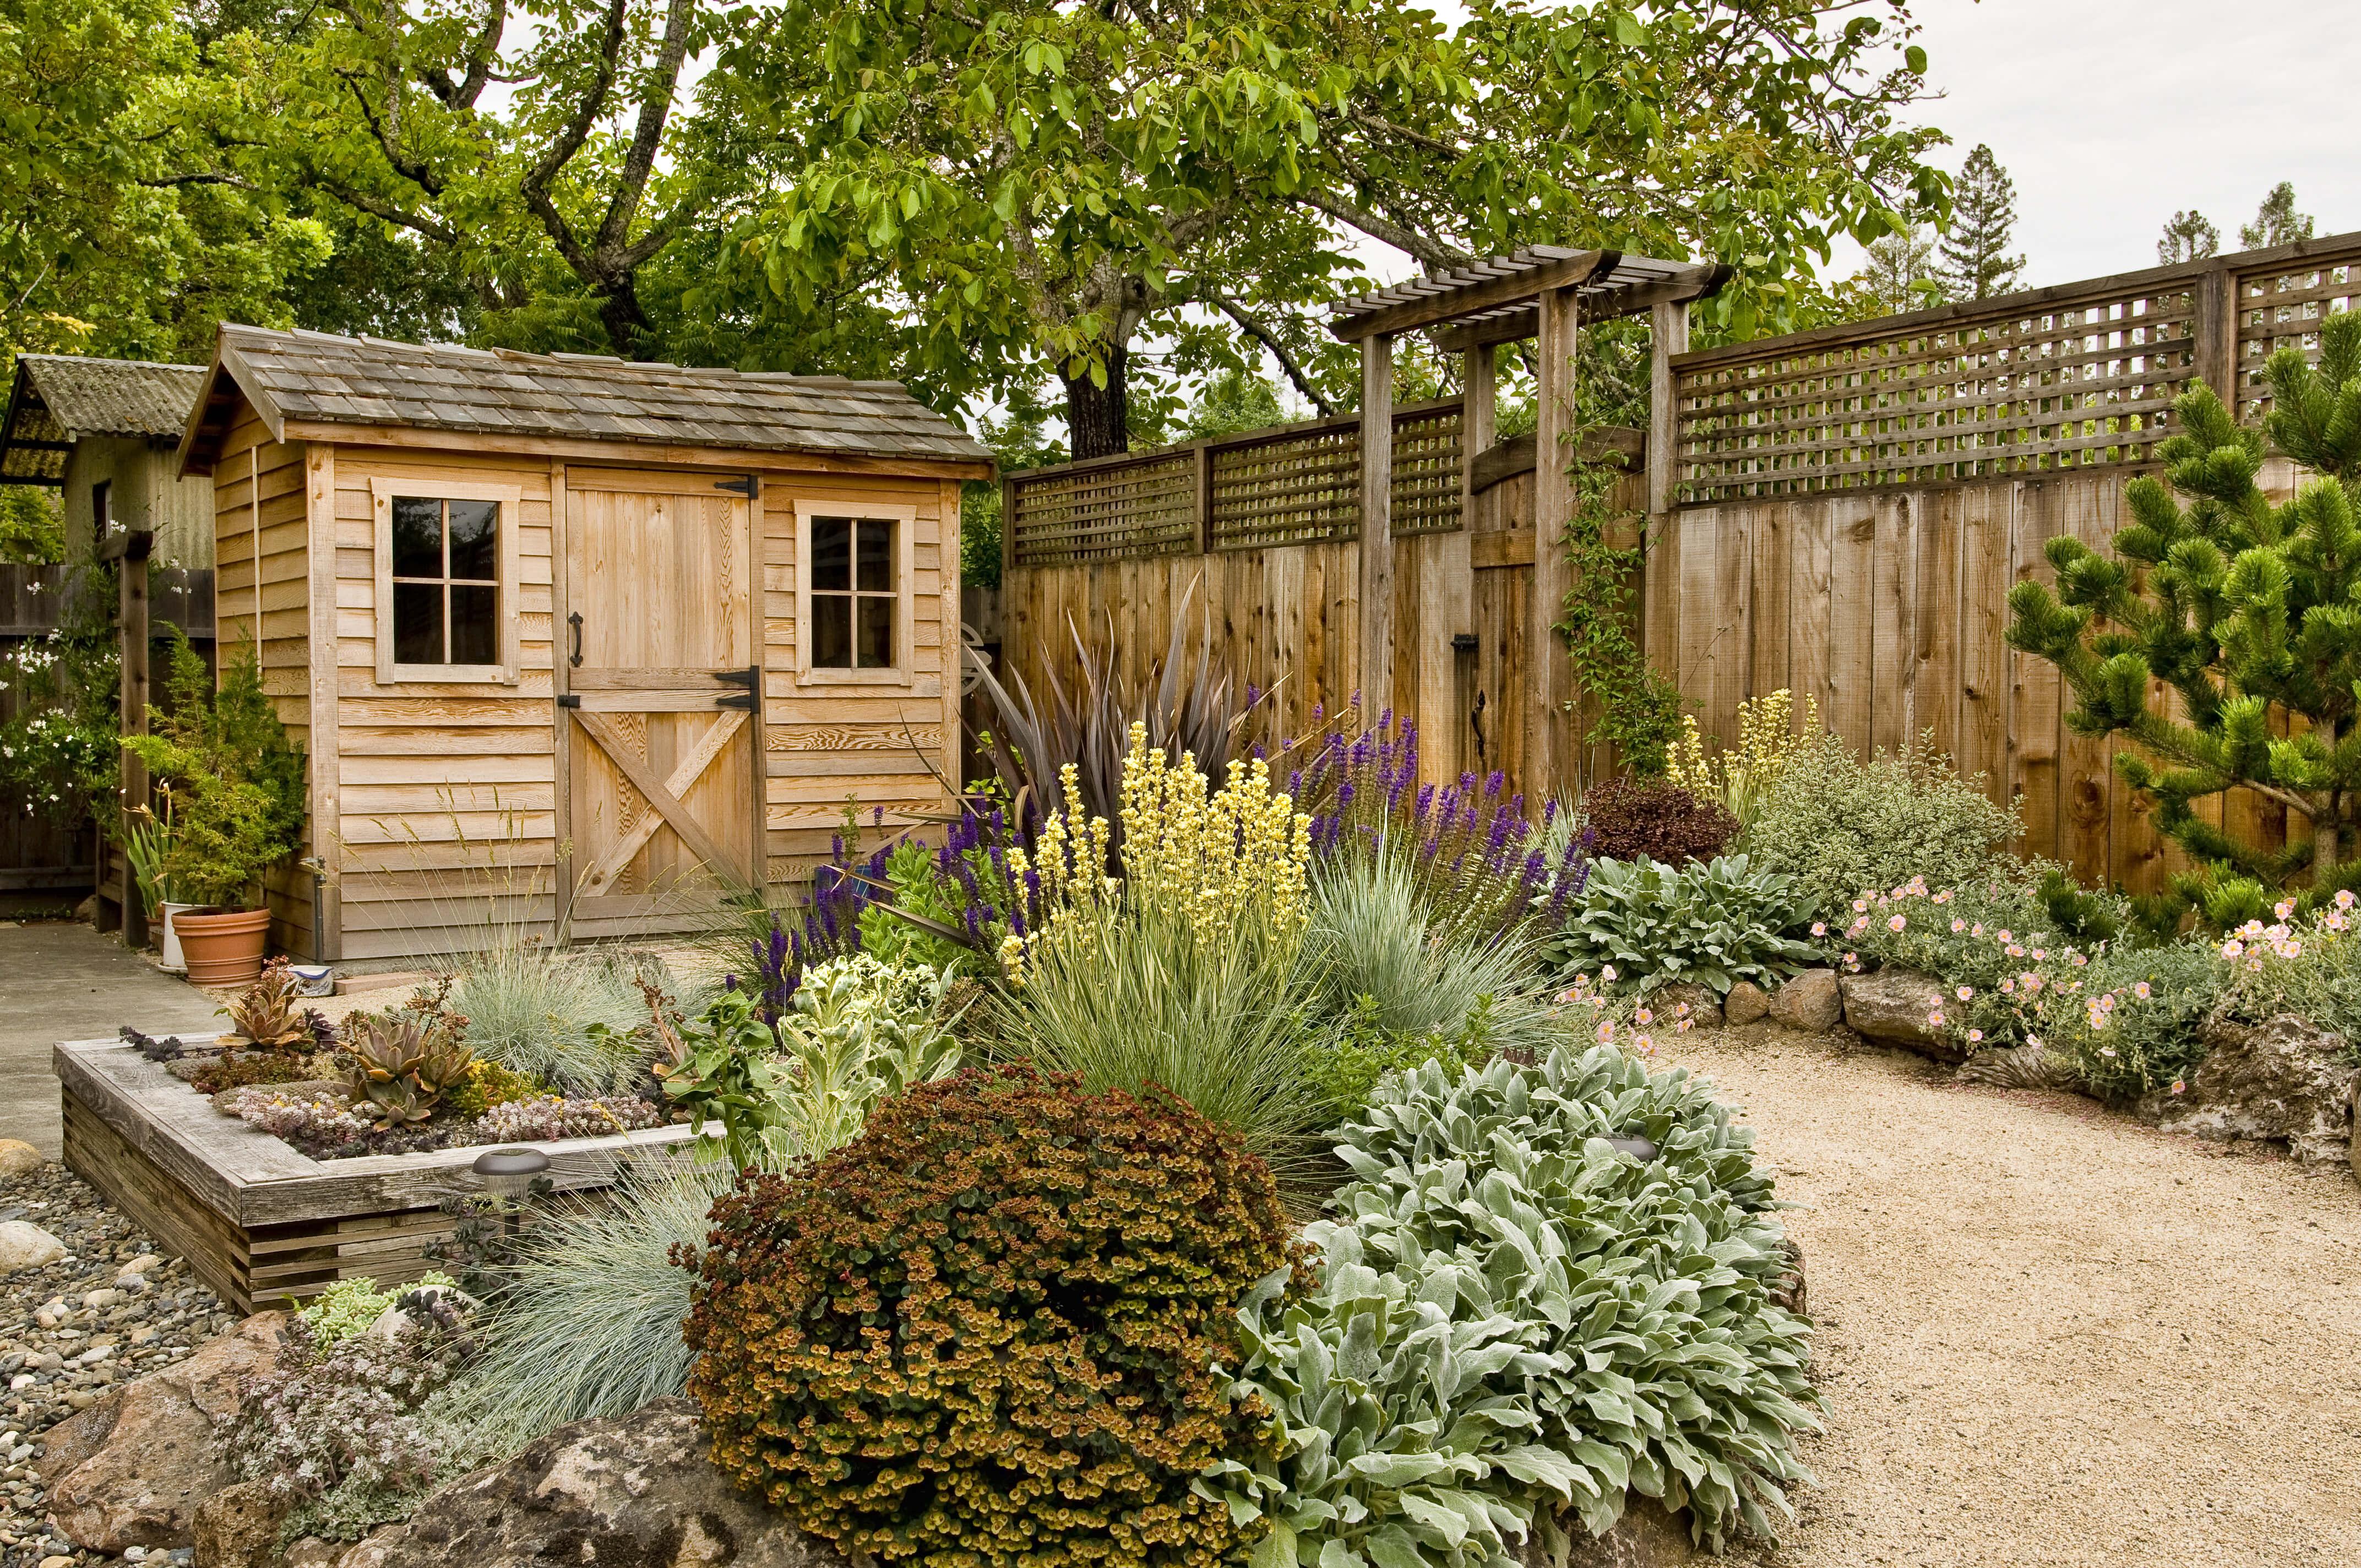 Garden Shed Care & Maintenance | Help & Advice